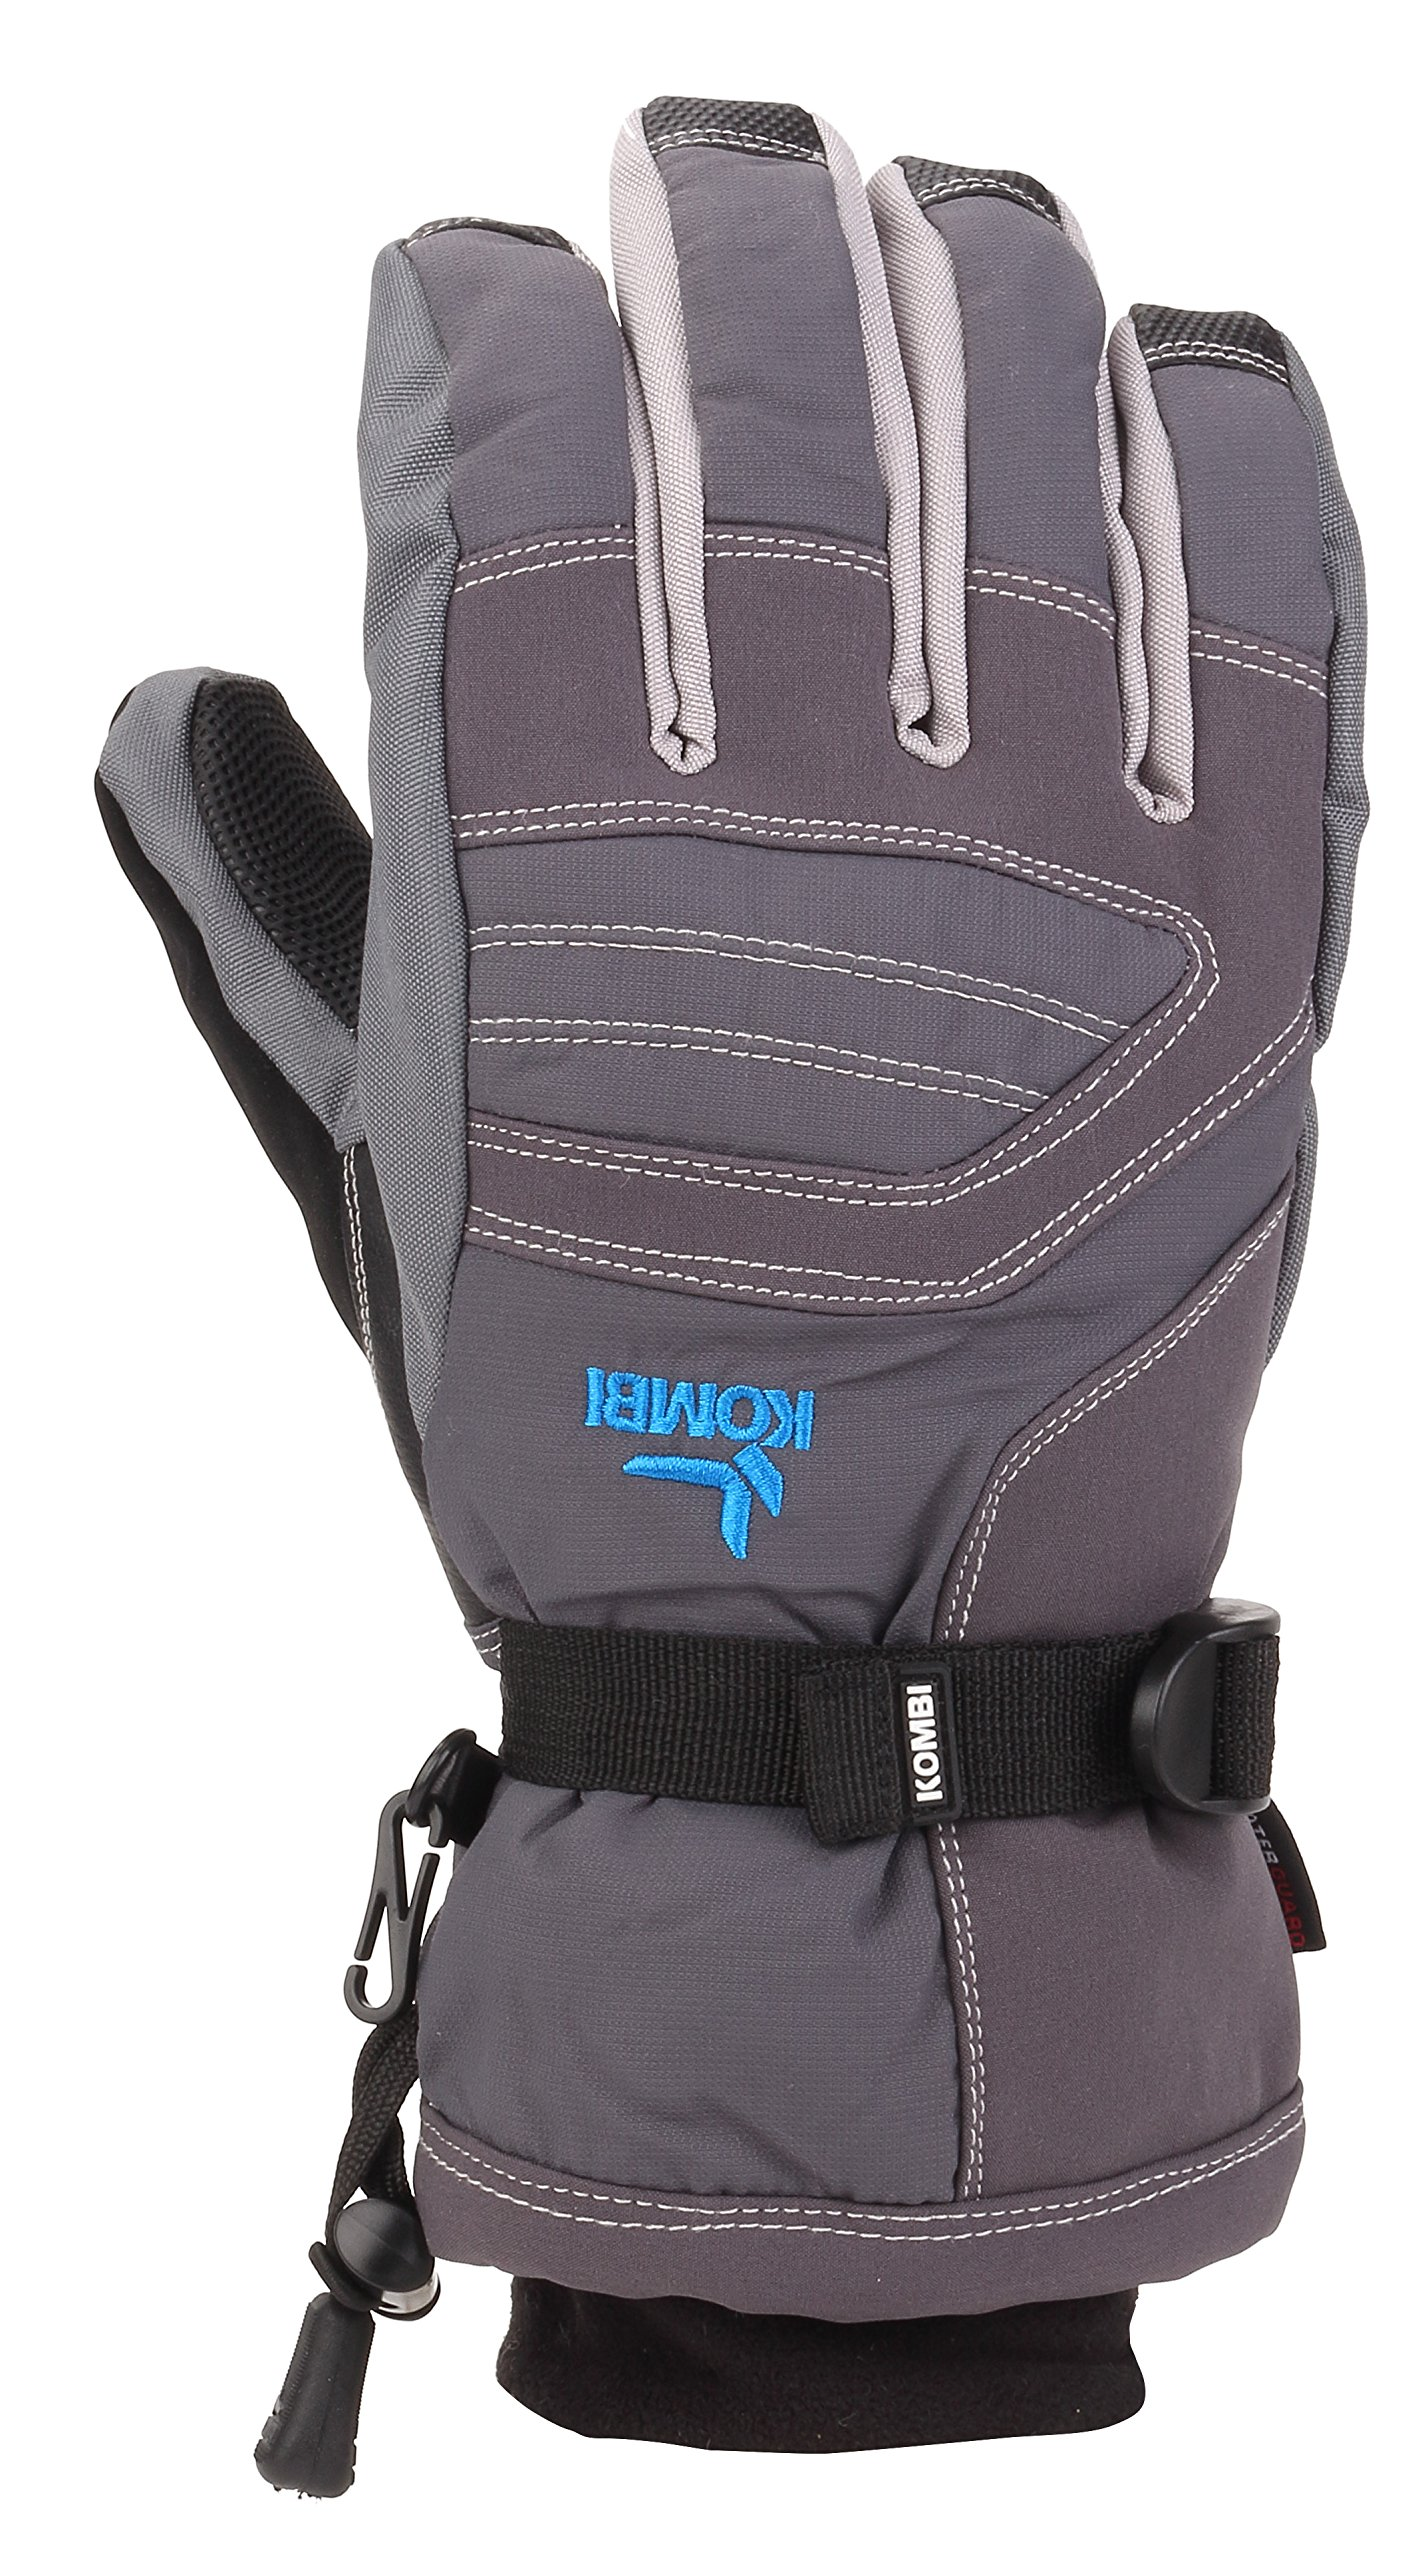 Kombi Women's Storm Cuff III Cold Weather Gloves, X-Large, Gunmetal